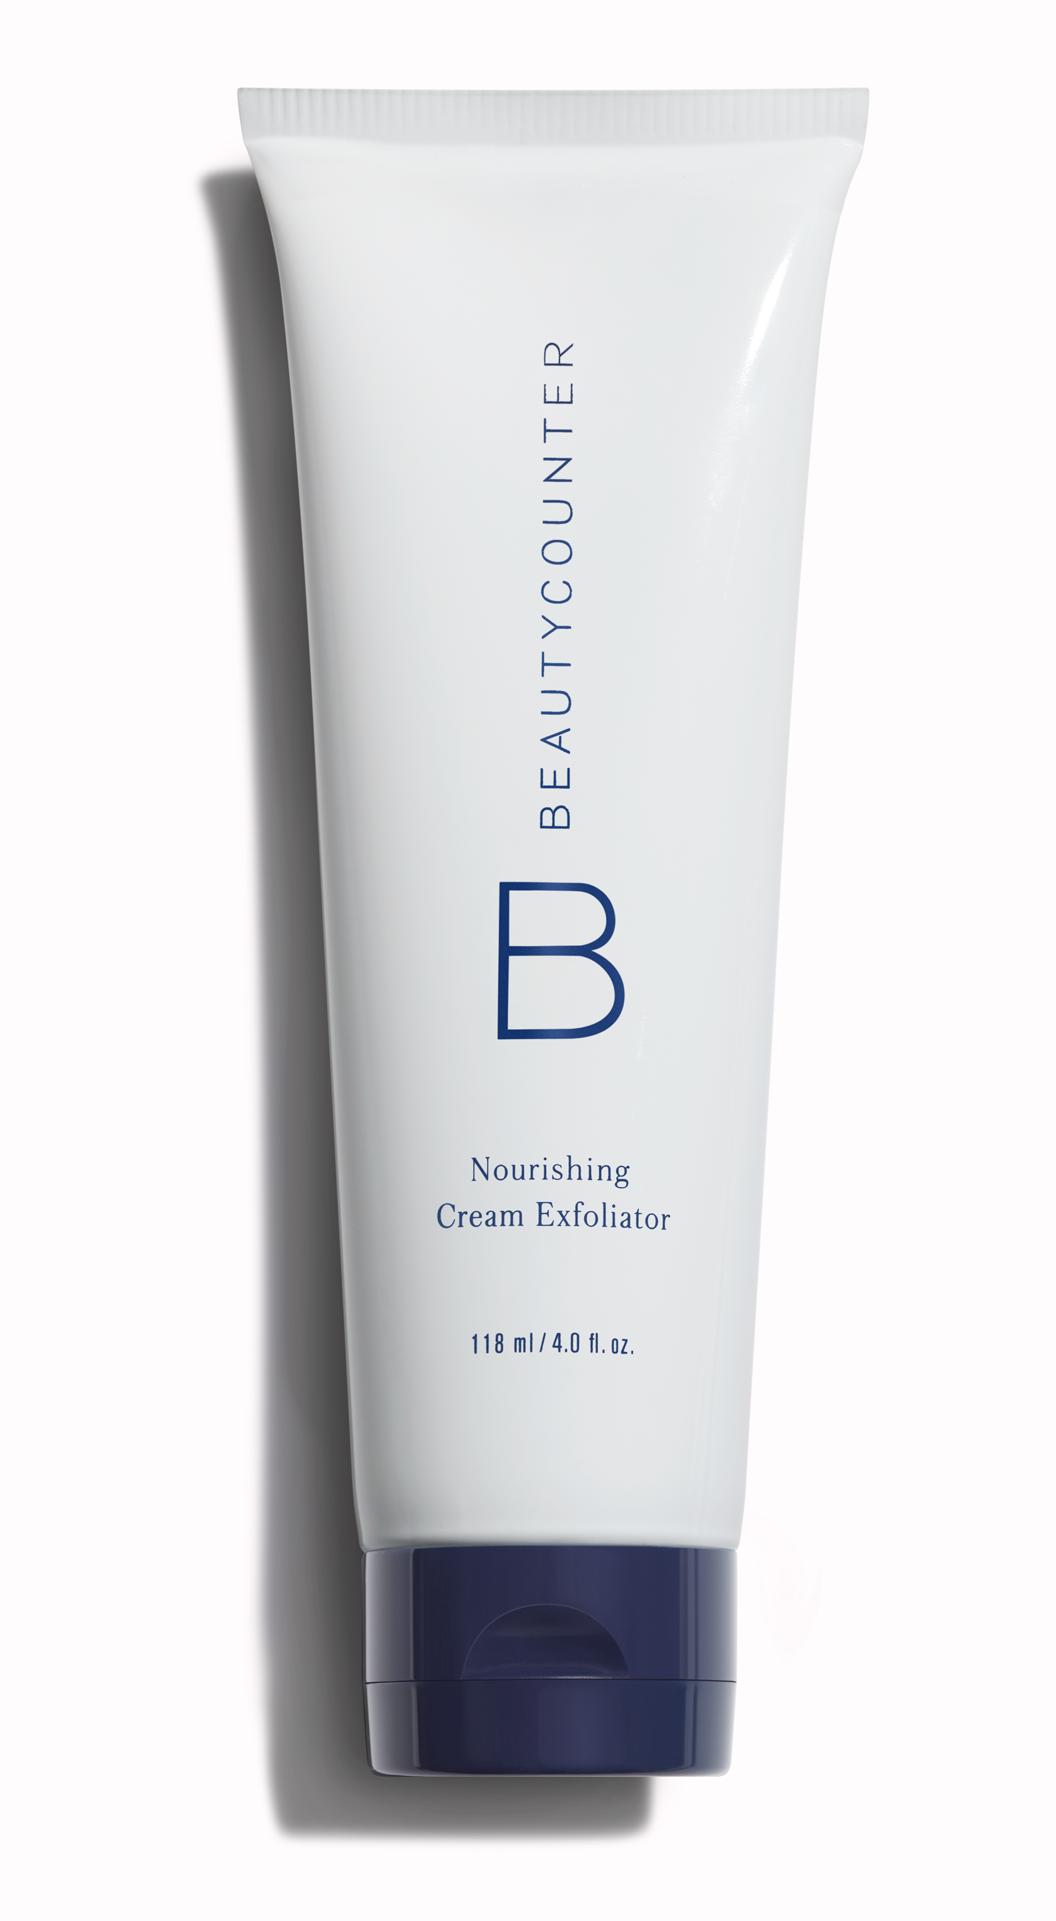 Nourishing cream exfoliator cleansers toners beautycounter ccuart Images